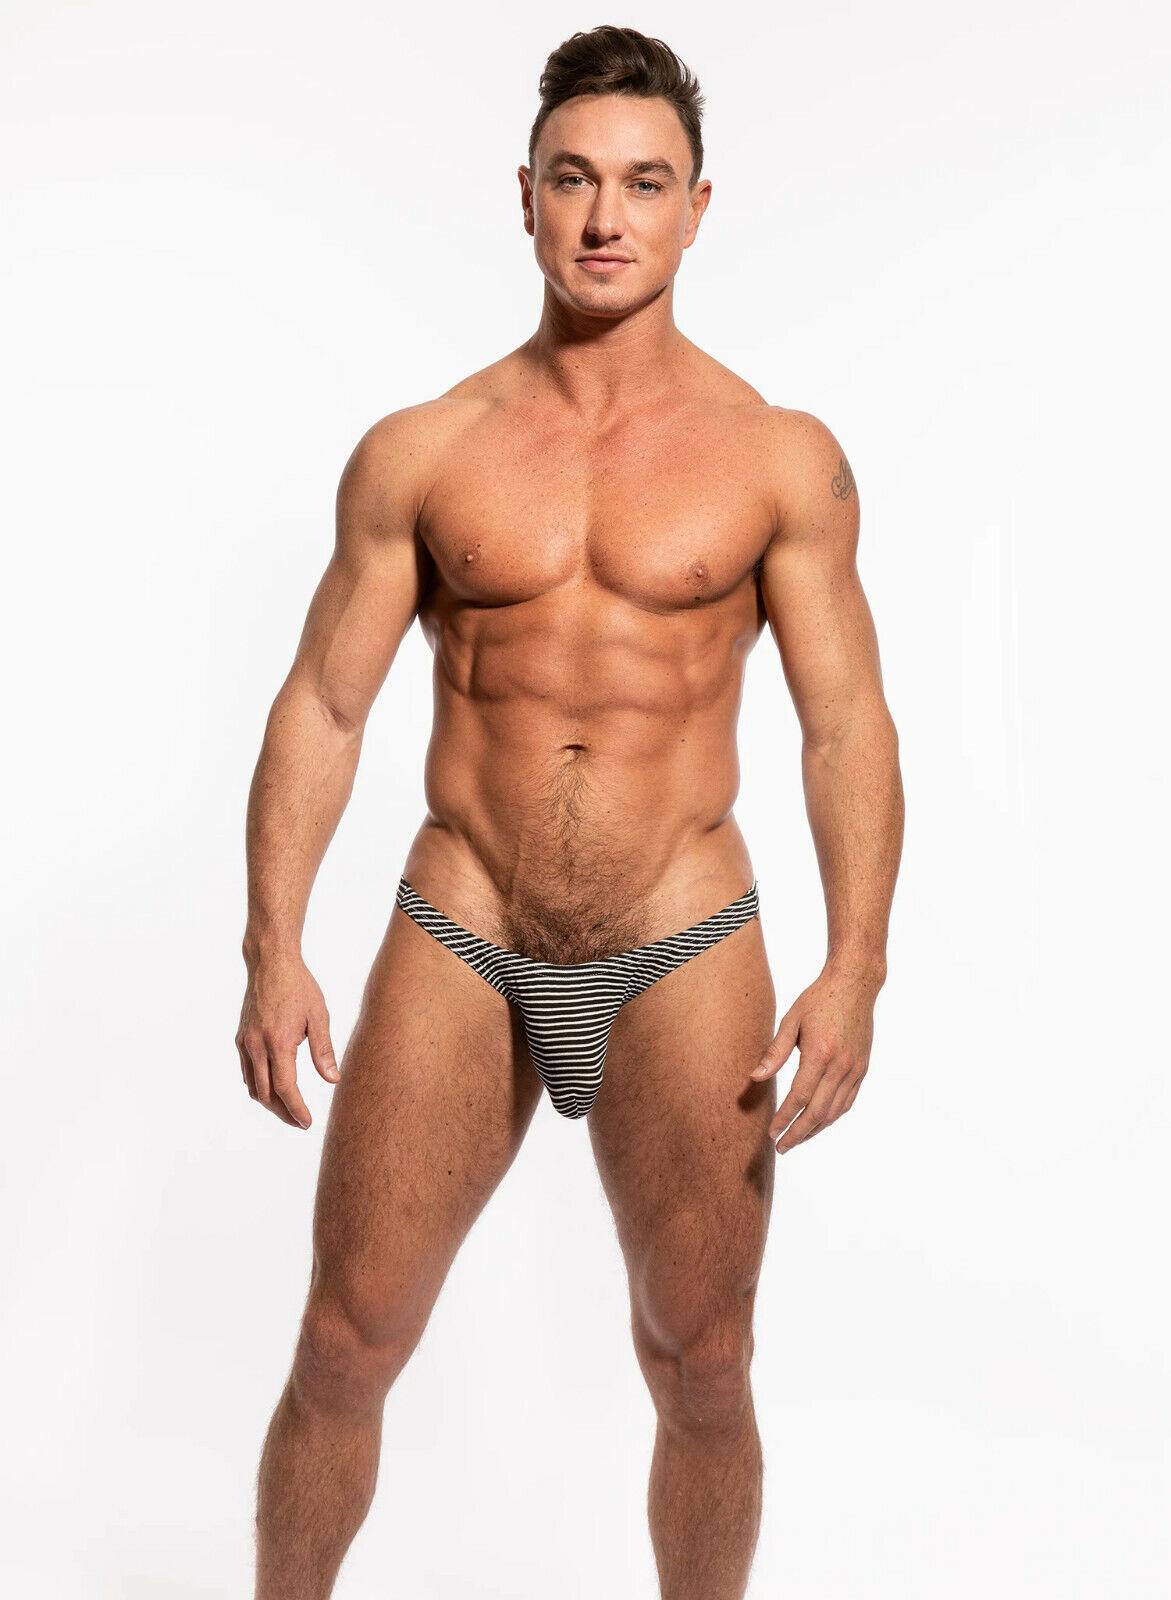 N2N Bodywear Men black mesh net thong g-string underwear Size S or L